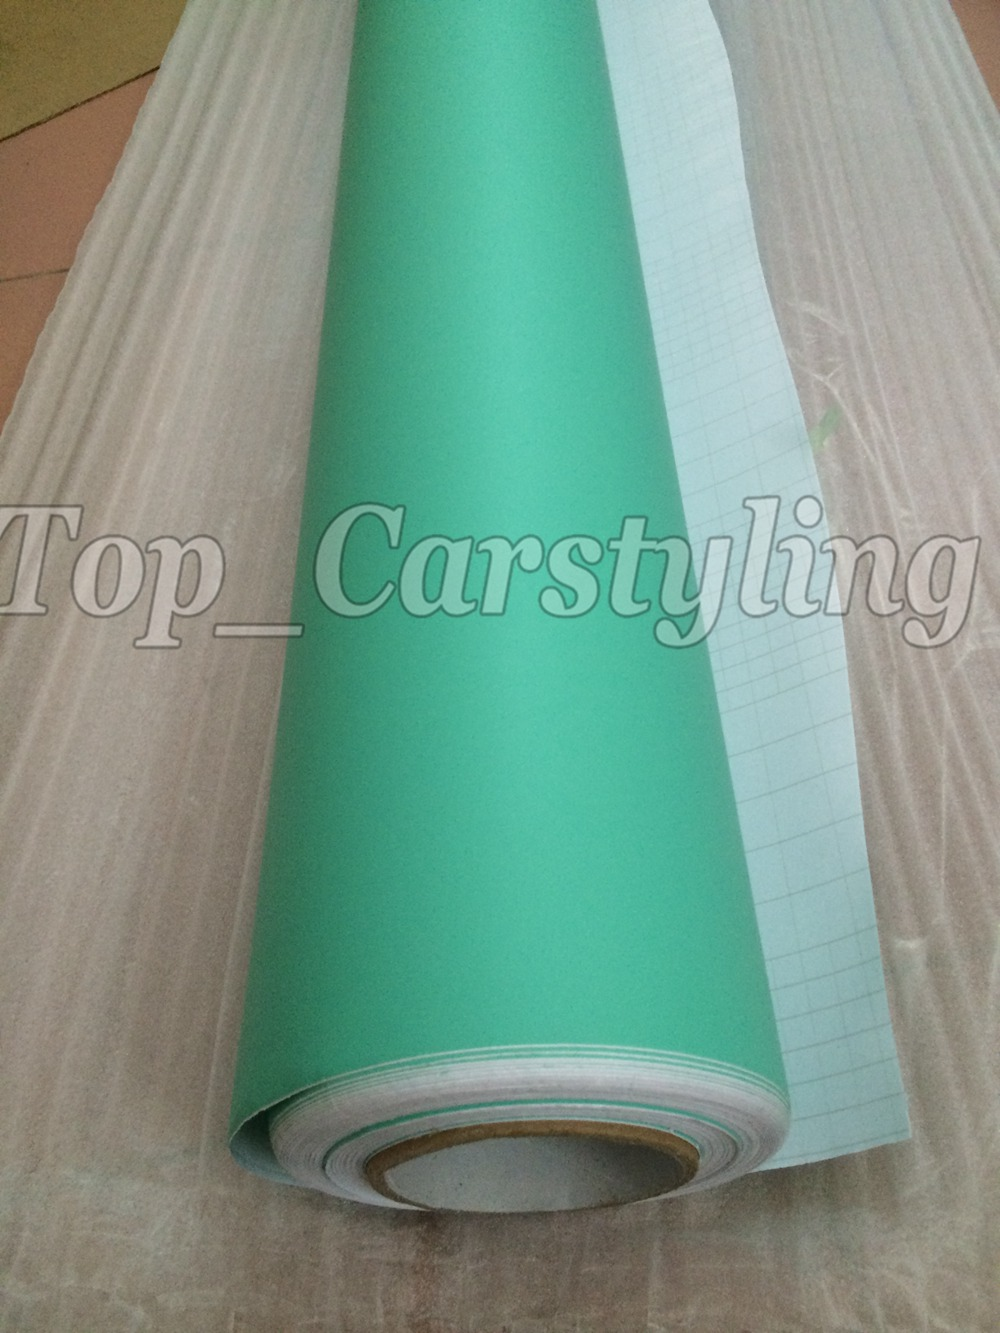 Matte tiffany blue mint green vinyl car wrapping film 3m satin white car wrap Film Foile (4)